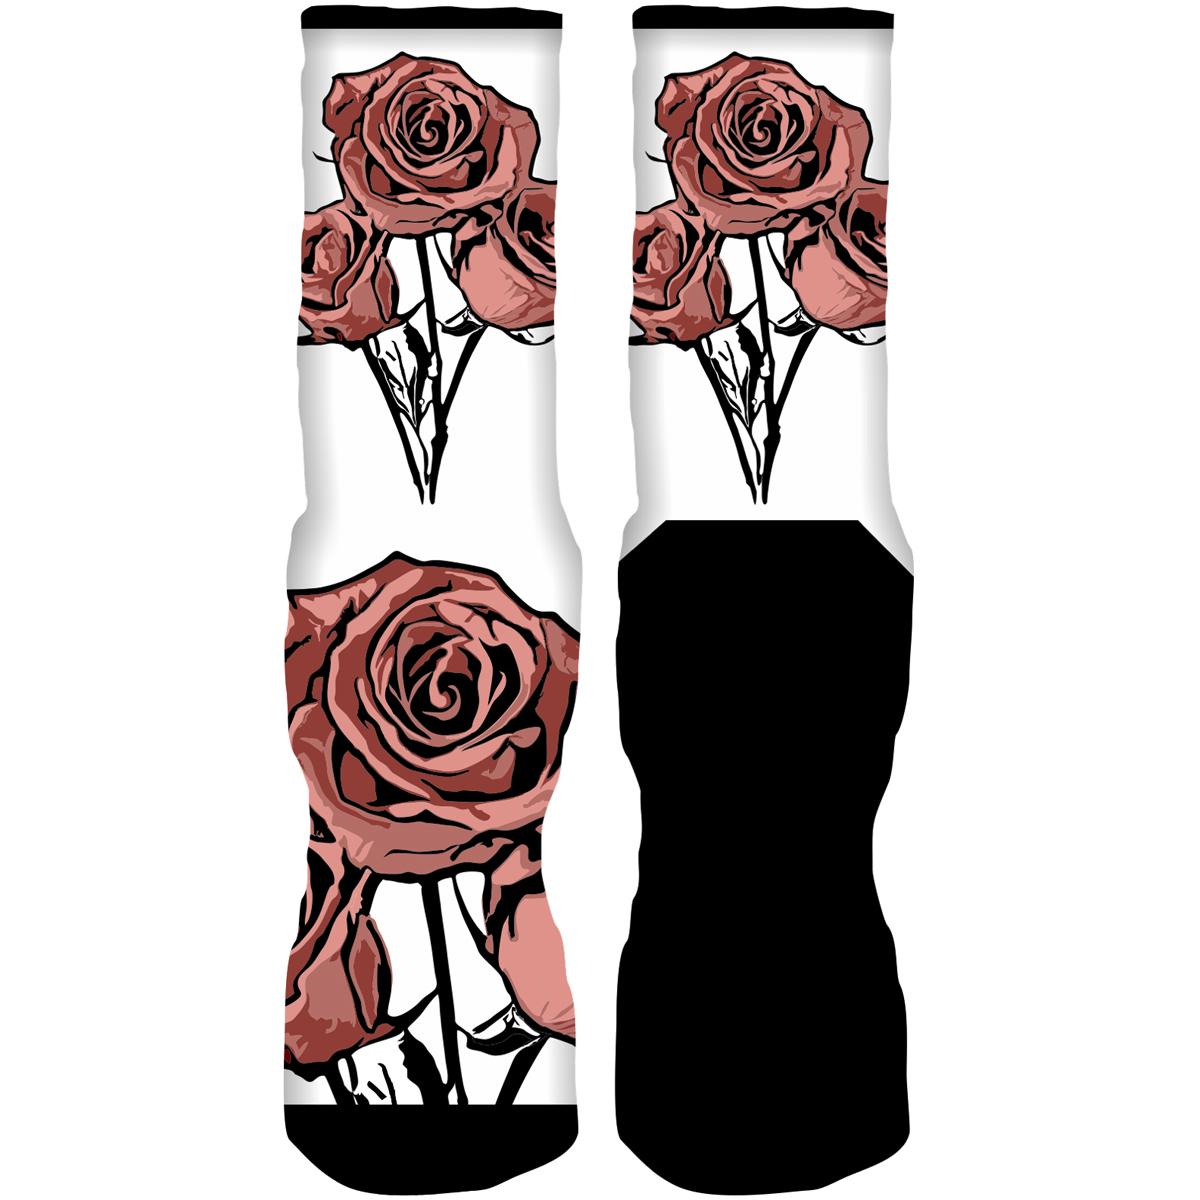 rust-pink-foamposites-socks-match-2